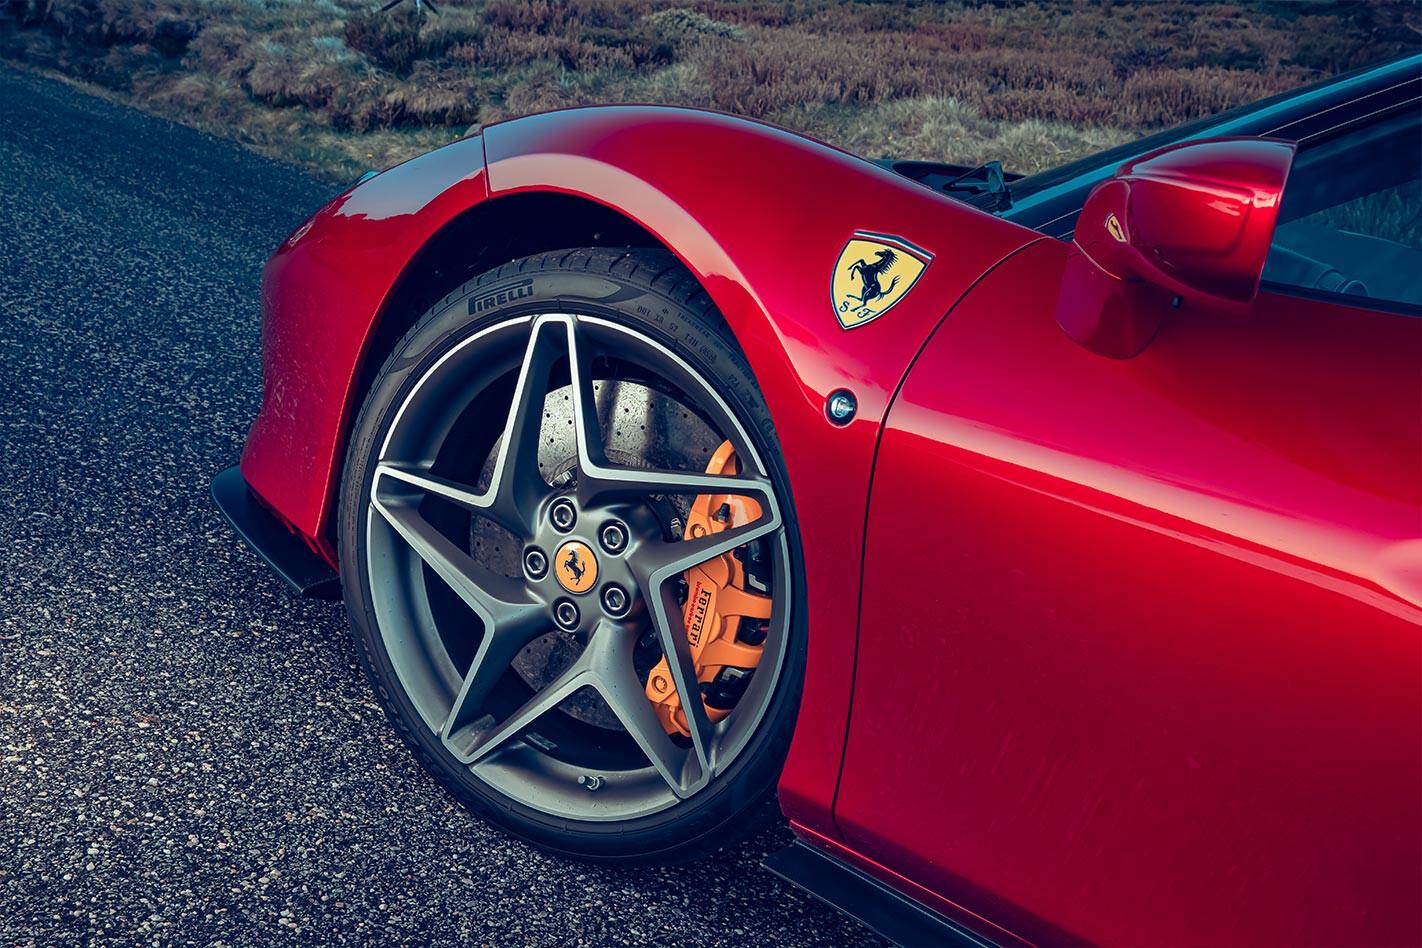 Ferrari F8 Tributo wheel